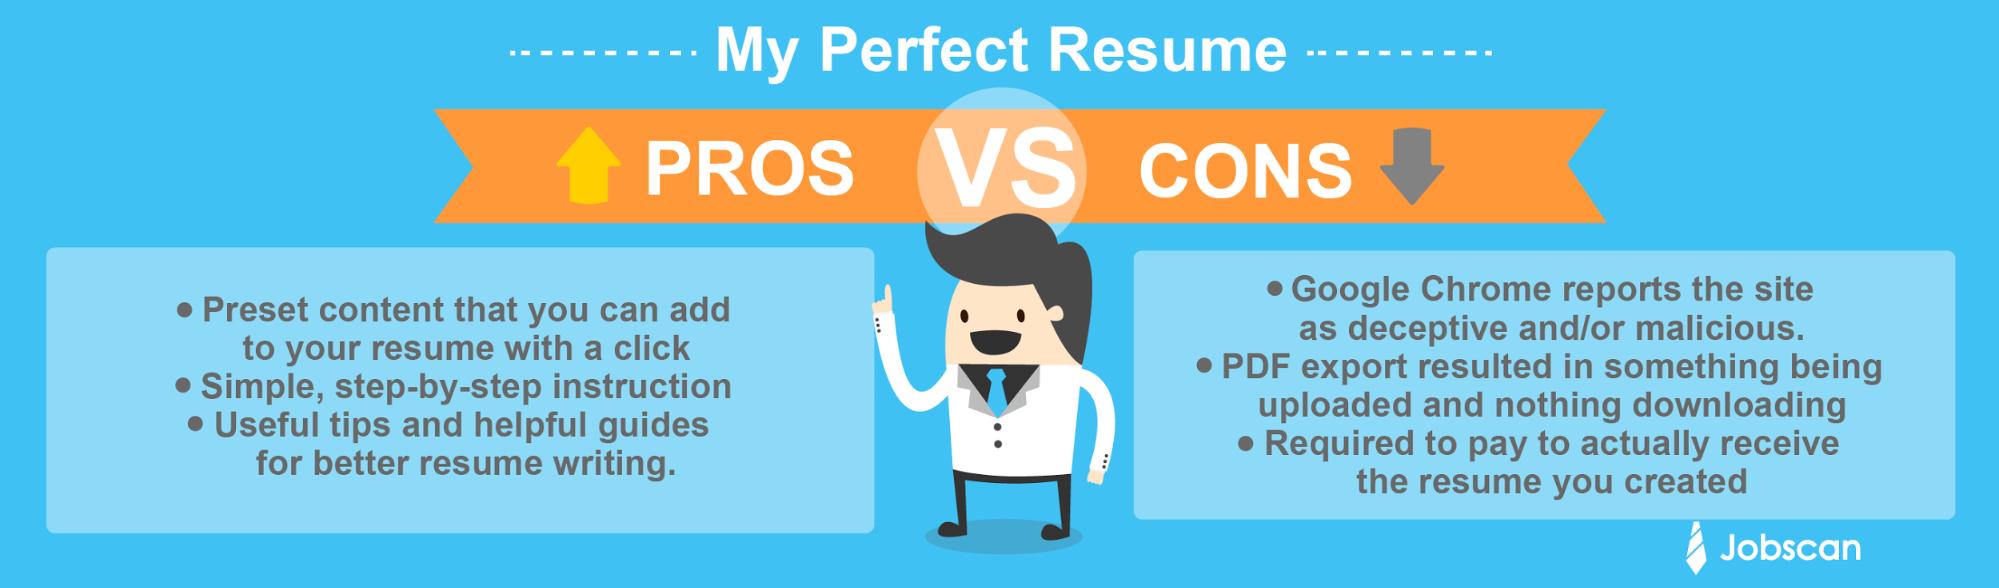 live career my perfect resume wwwmarkushenritk